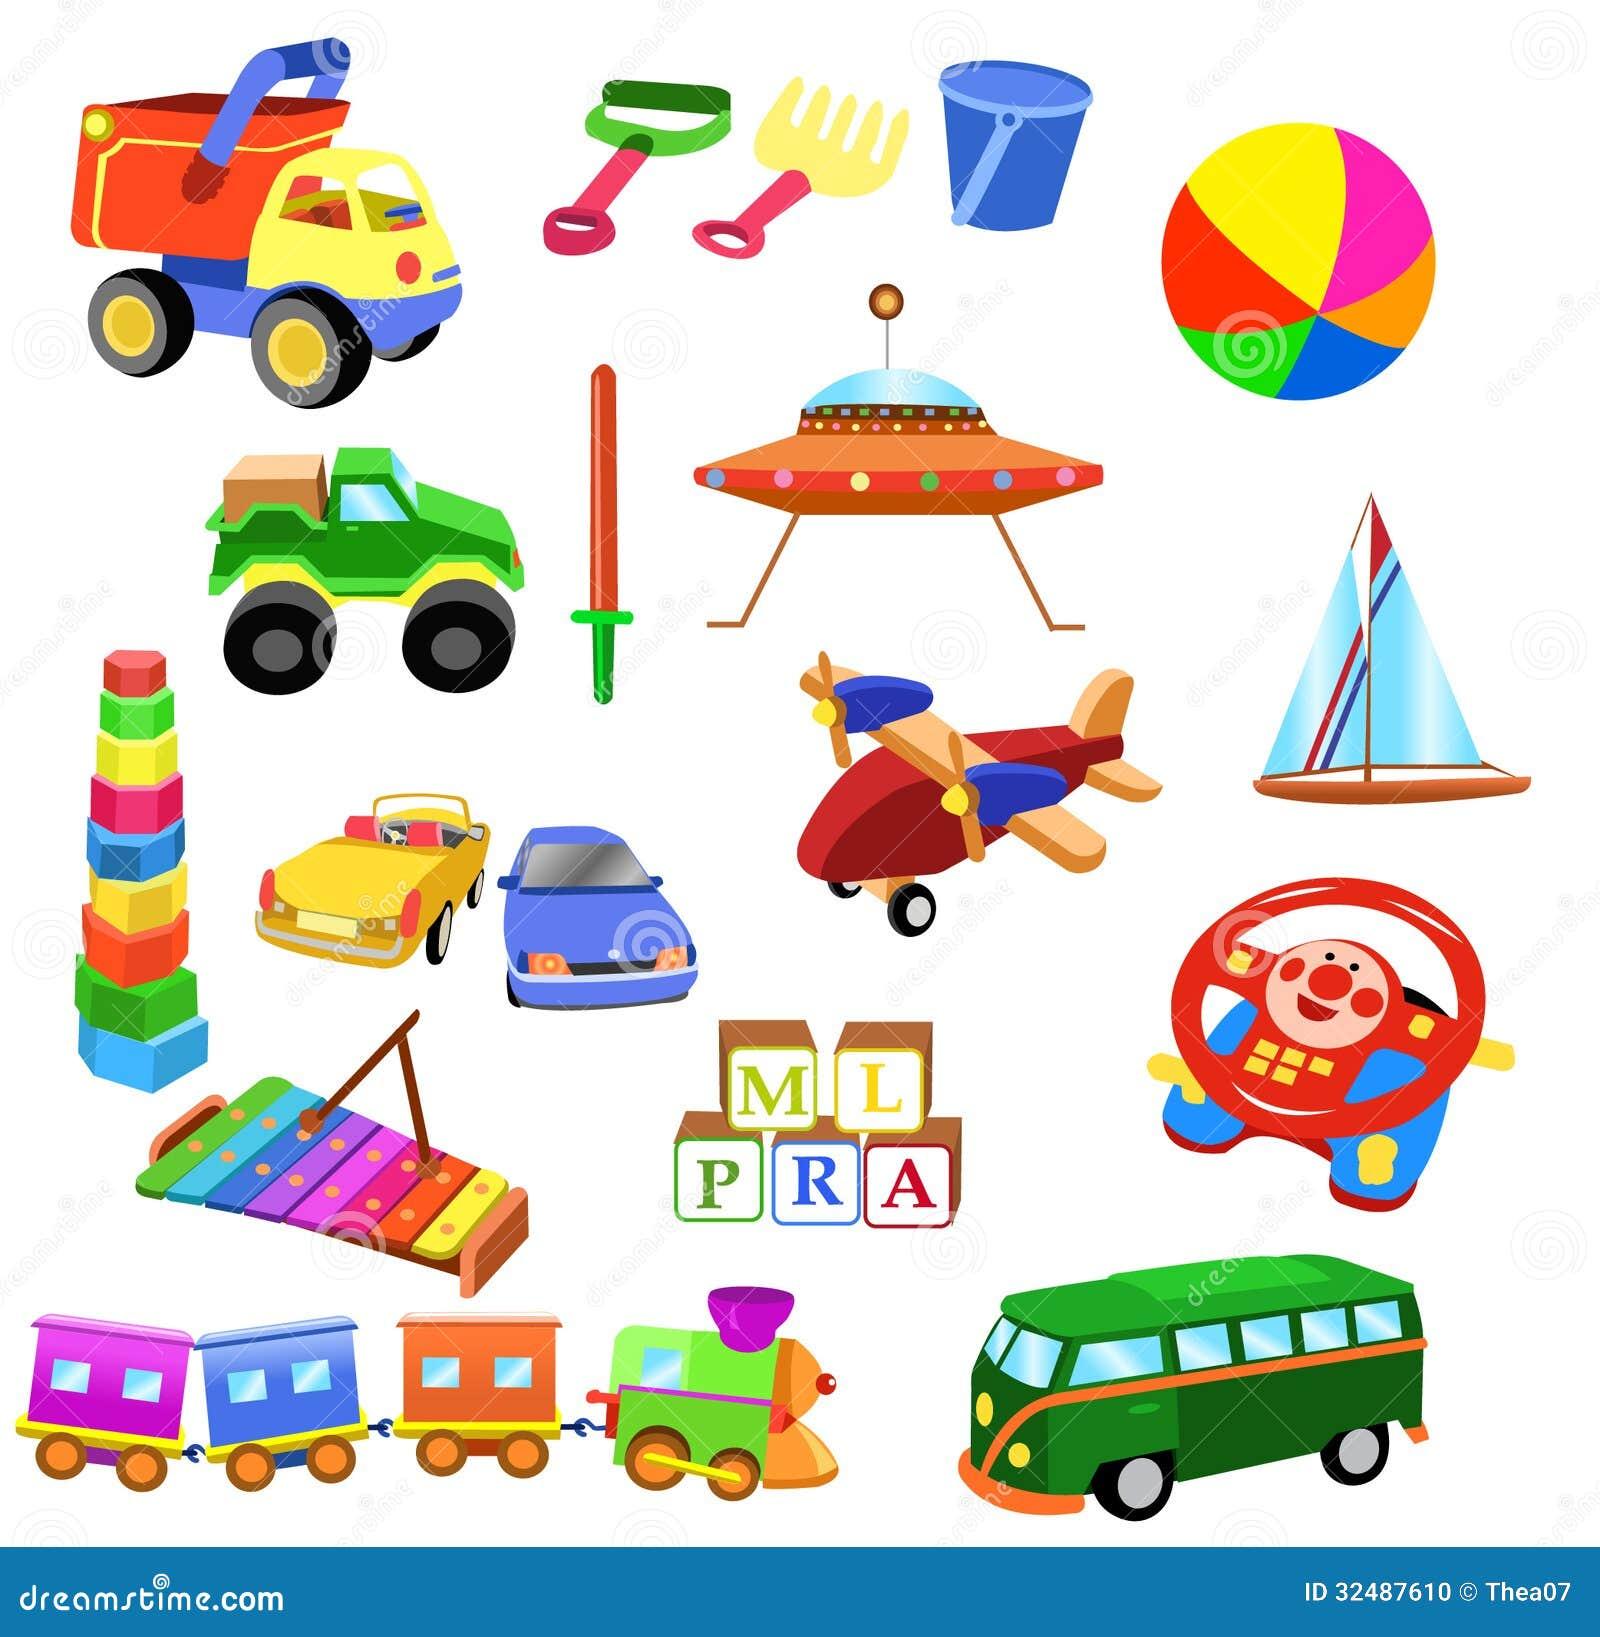 Girl Toys Clip Art : Sistema de juguetes foto archivo imagen